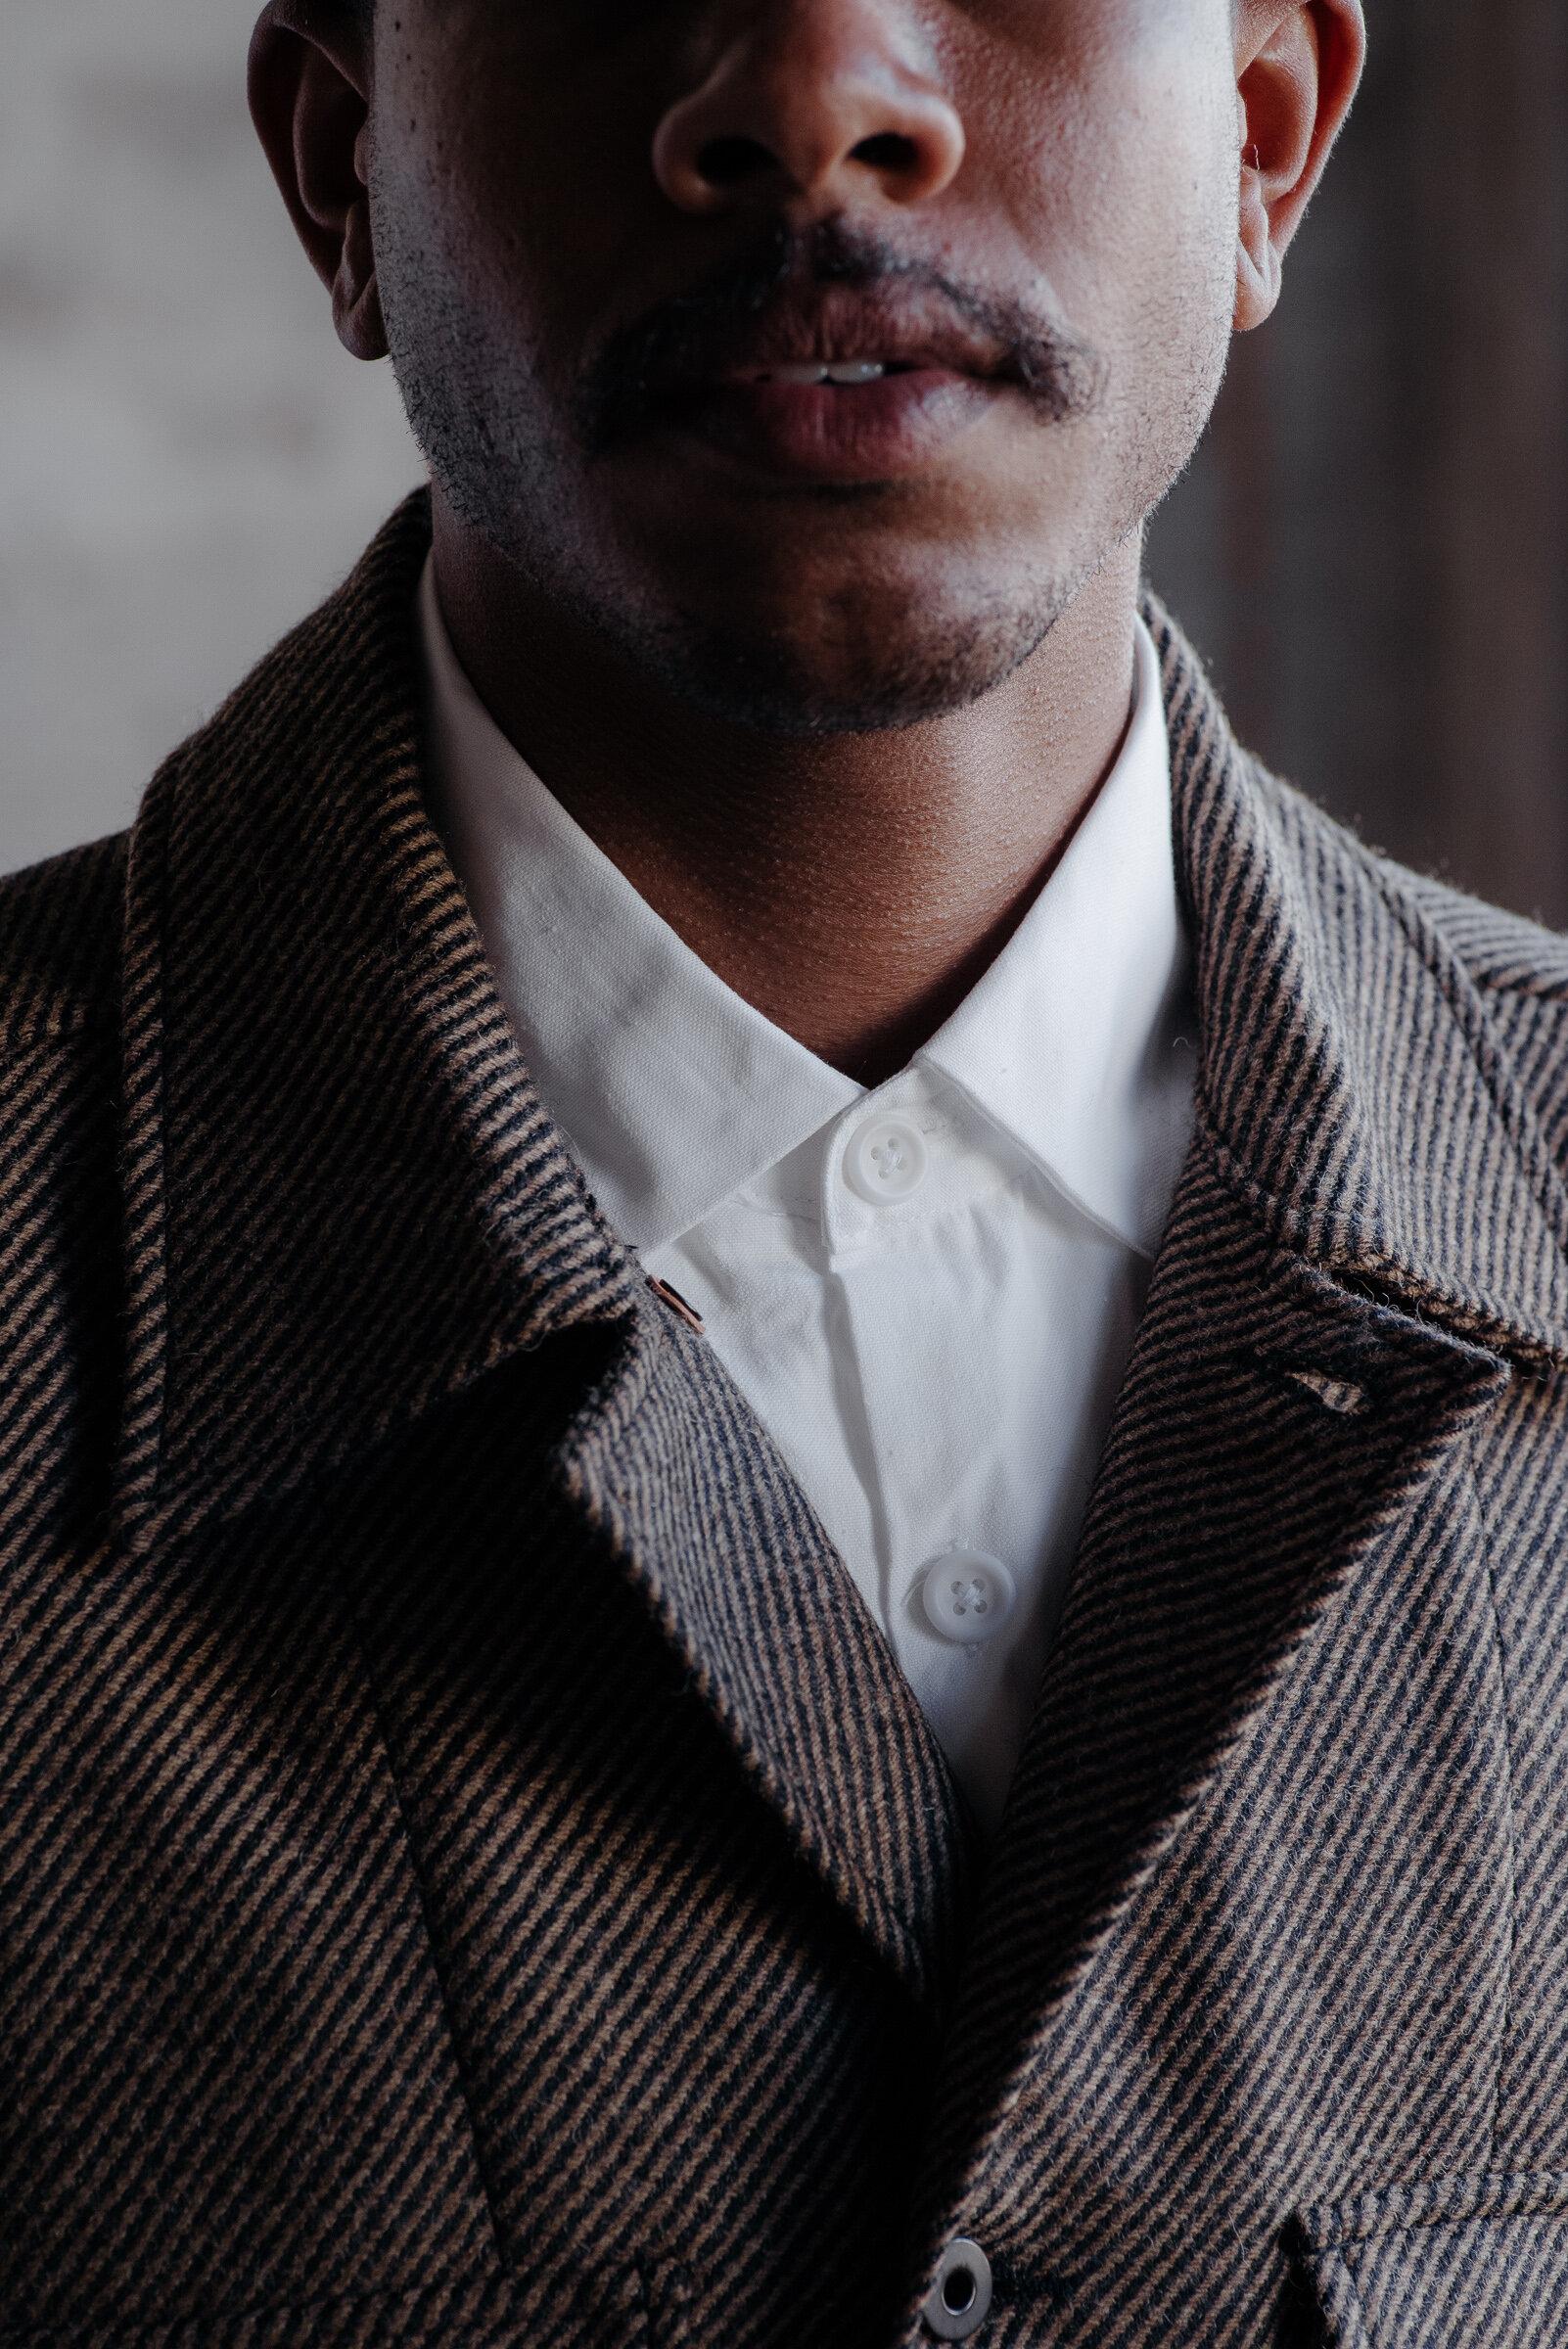 evan-kinori-bellow-pocket-jacket-lambswool-twill-woven-in-ireland-7